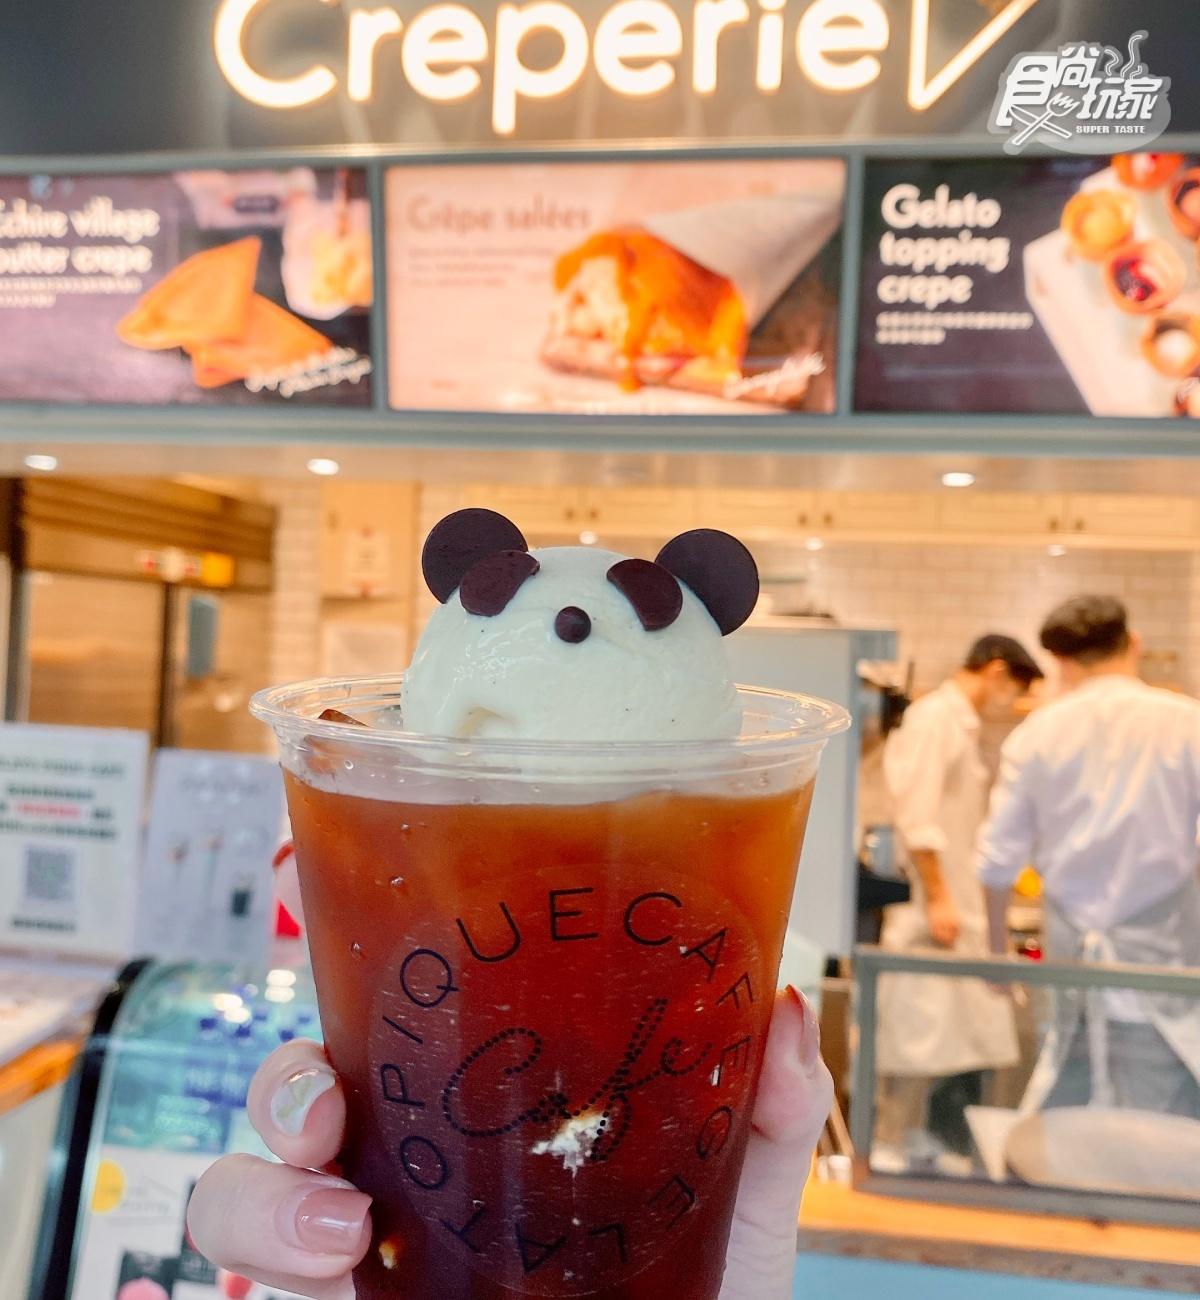 gelato pique cafe「熊貓可麗餅、漂浮黑咖啡」萌翻!熊貓玻璃杯可愛必收